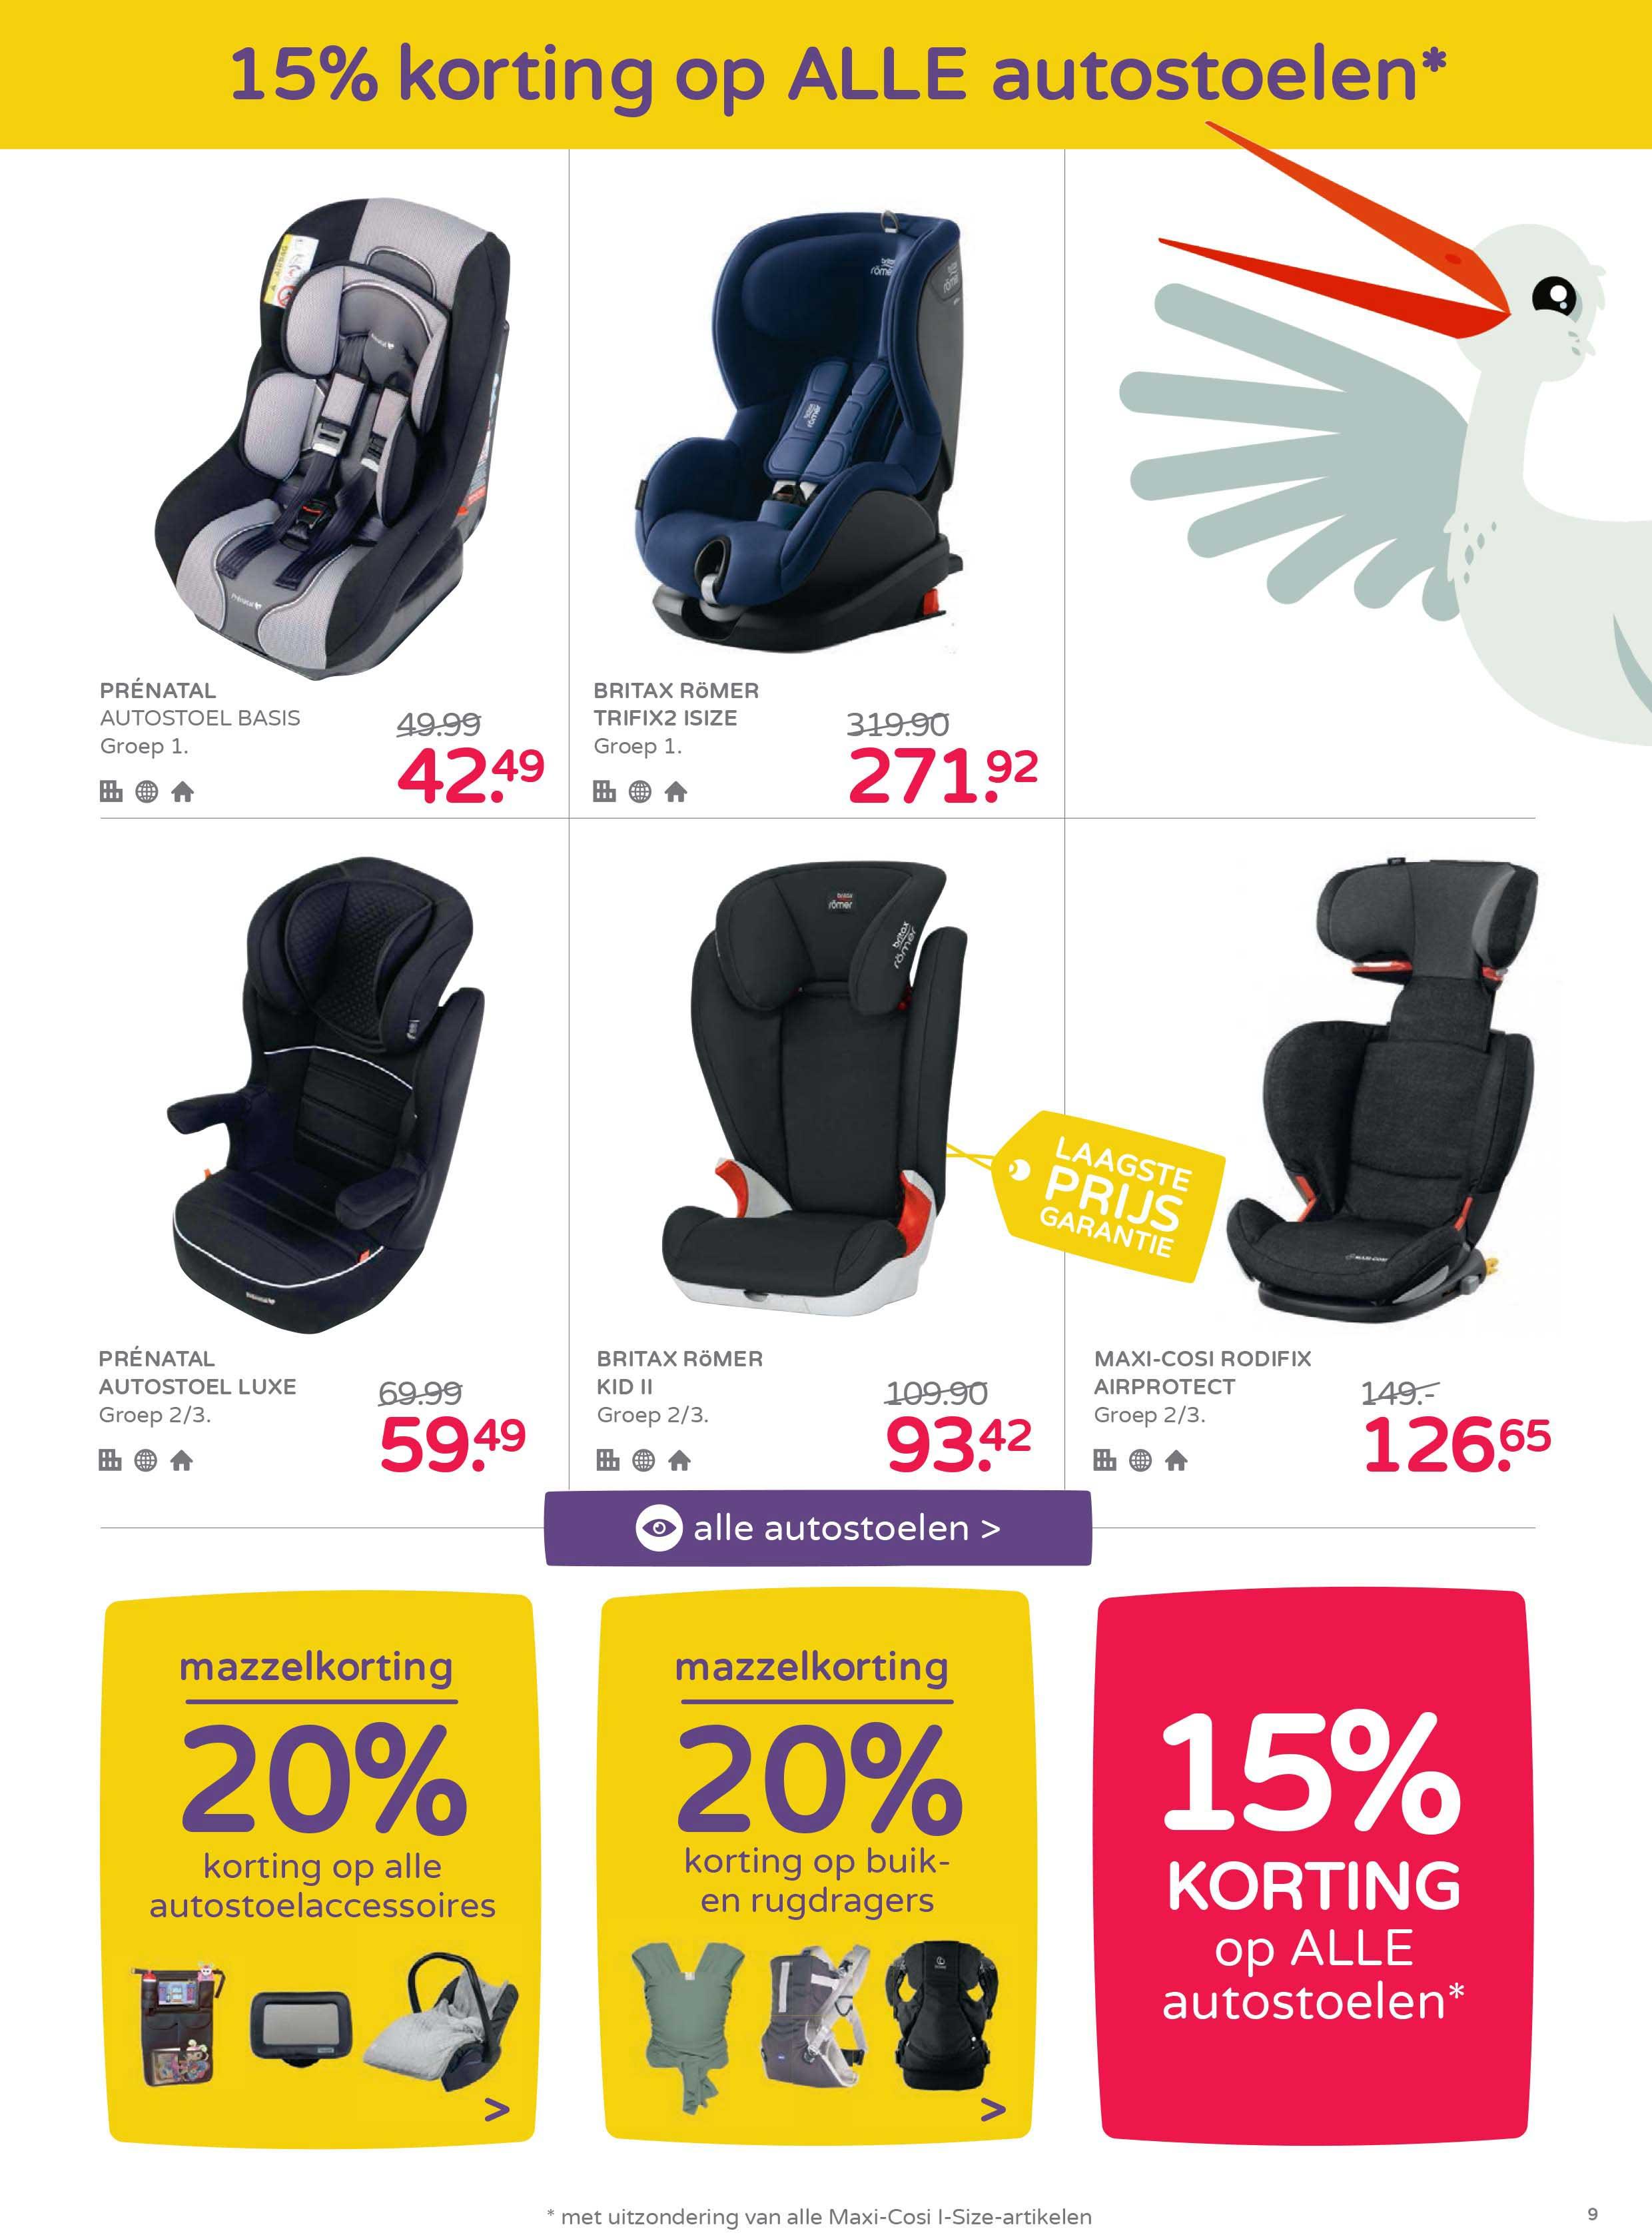 Prénatal 15% Korting Op ALLE Autostoelen